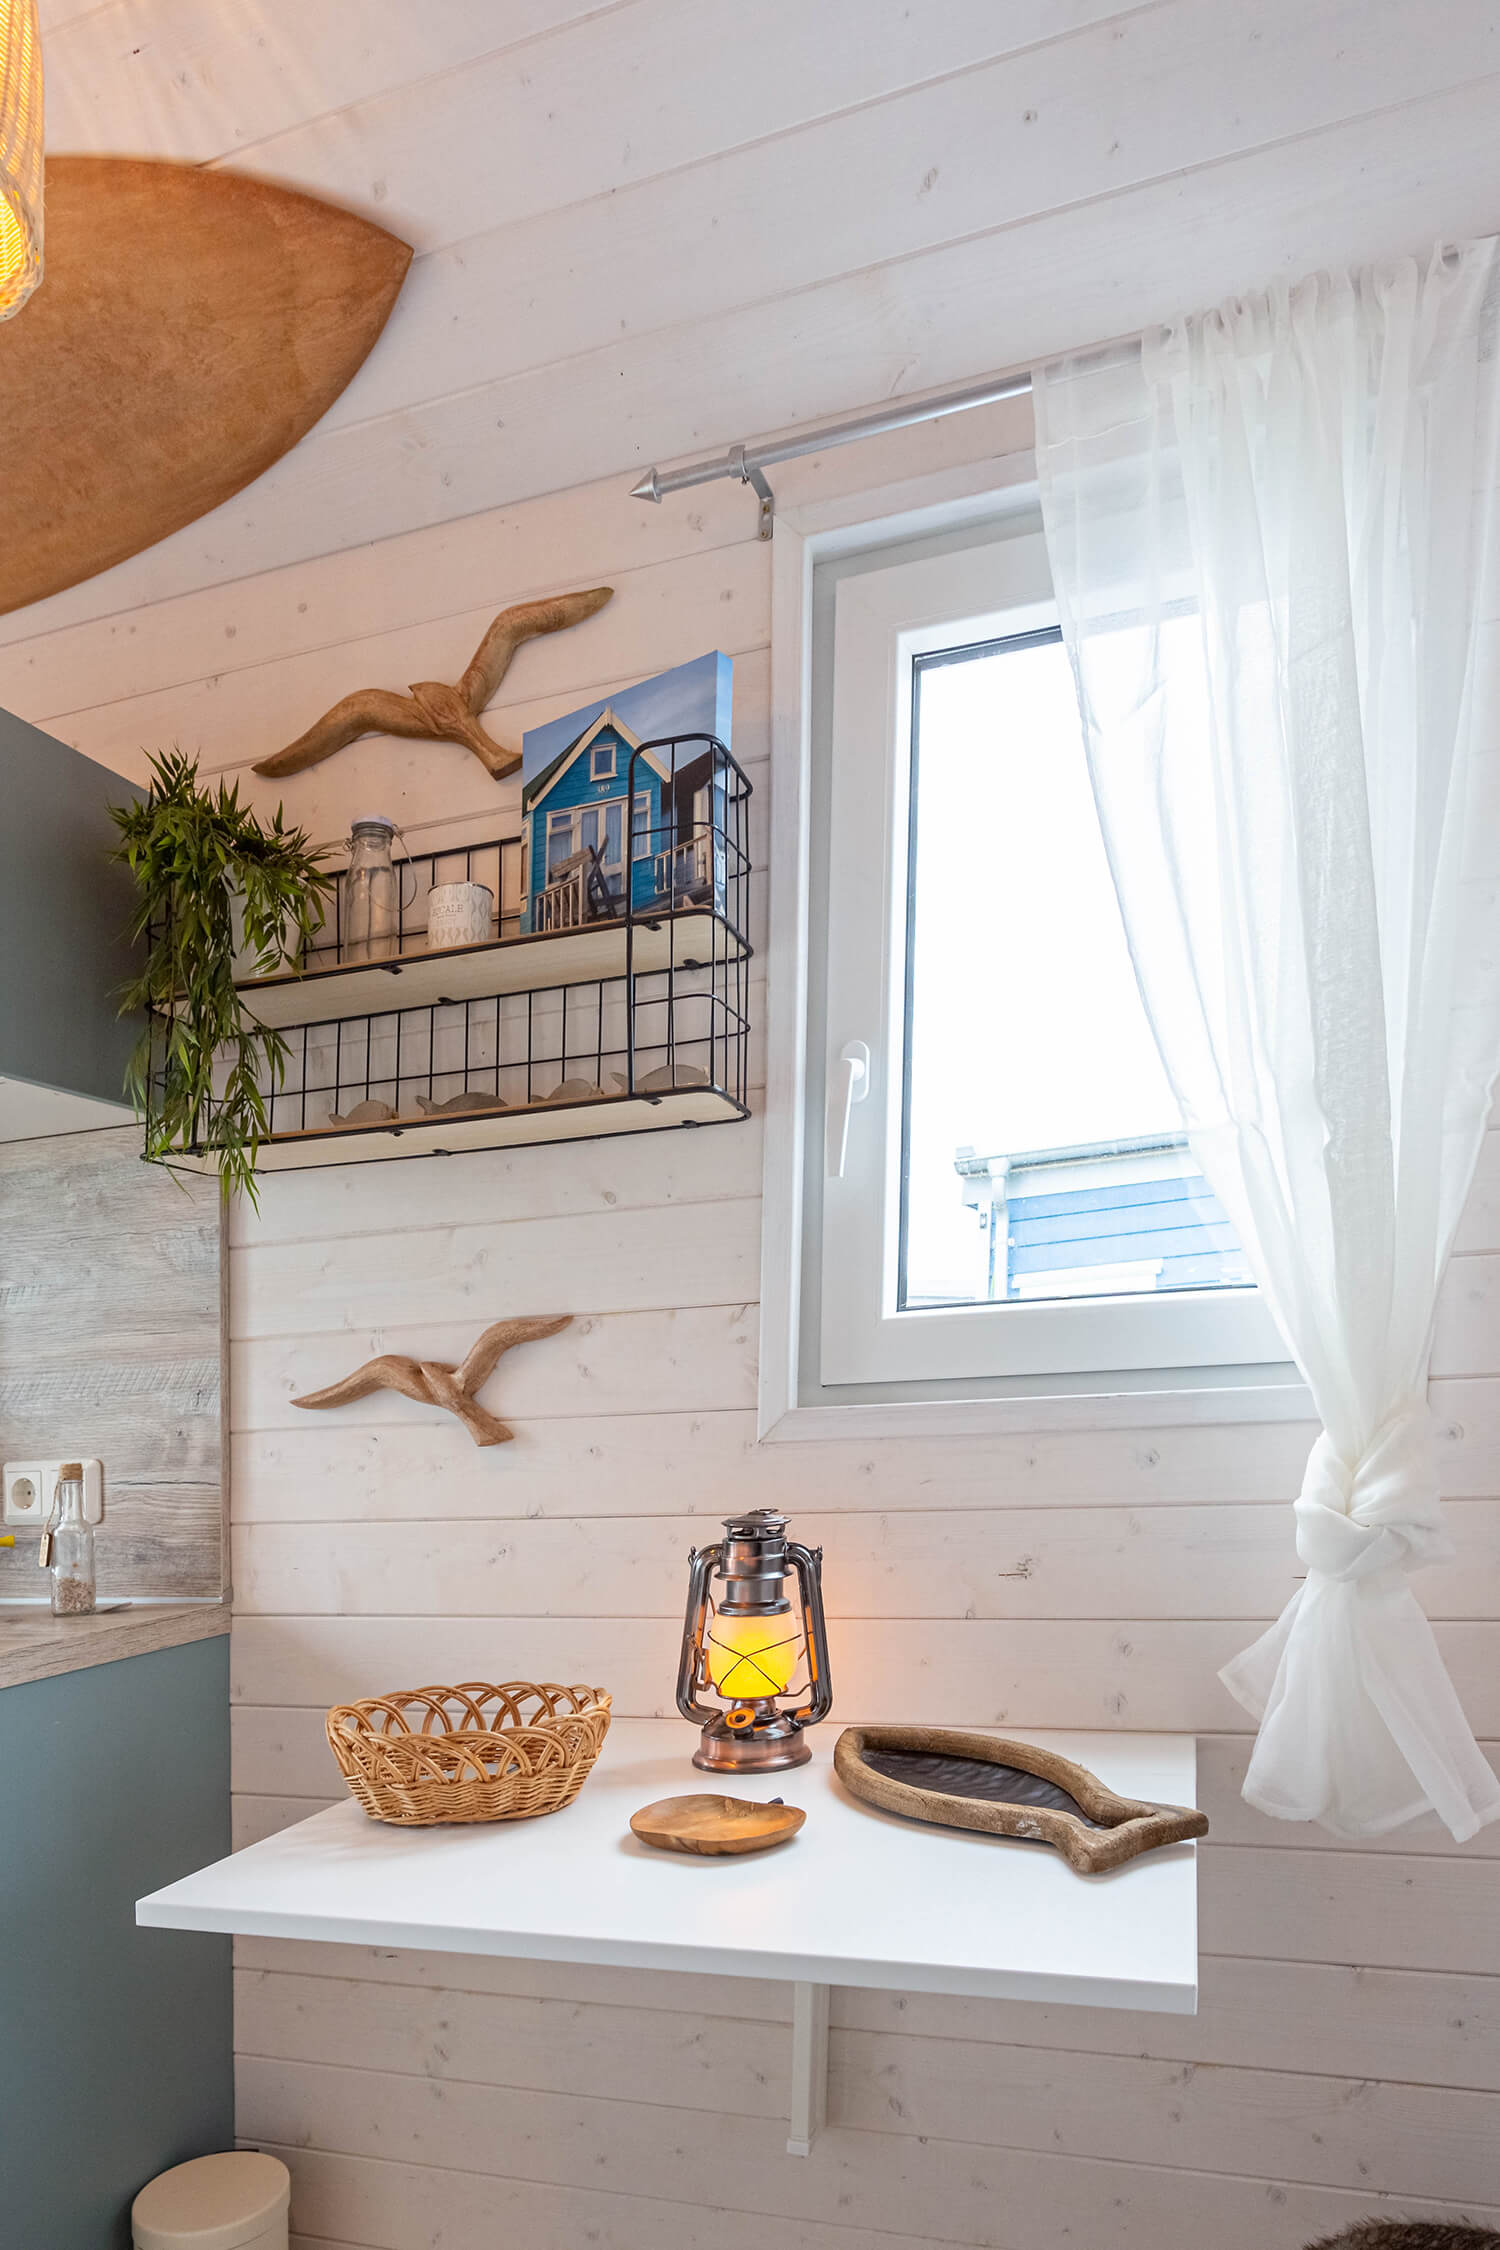 mobiles-tiny-house-kueste-vital-camp-gmbh22